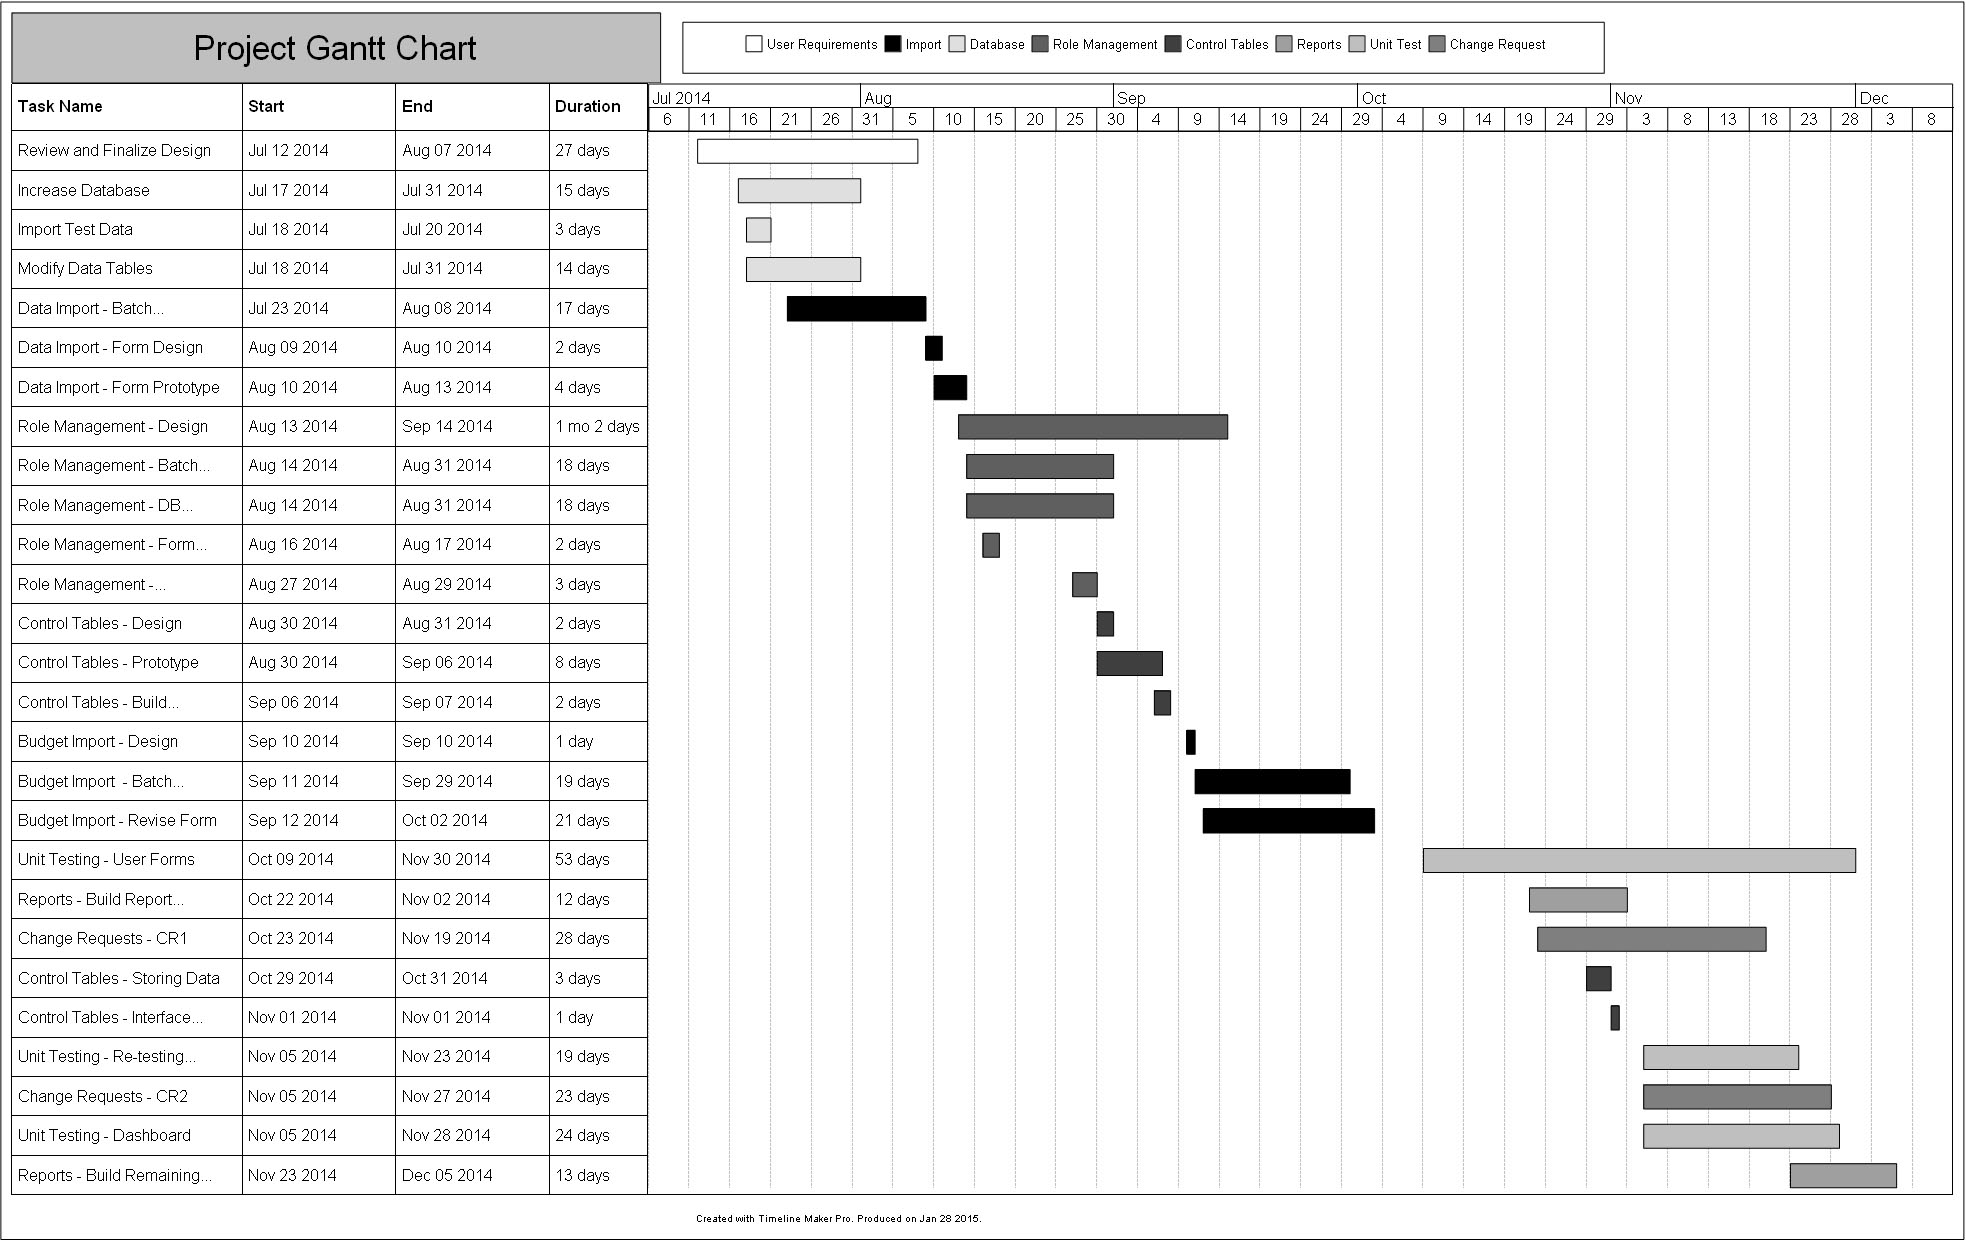 Project Plan Sample Gantt Chart Created by Timeline Maker Pro